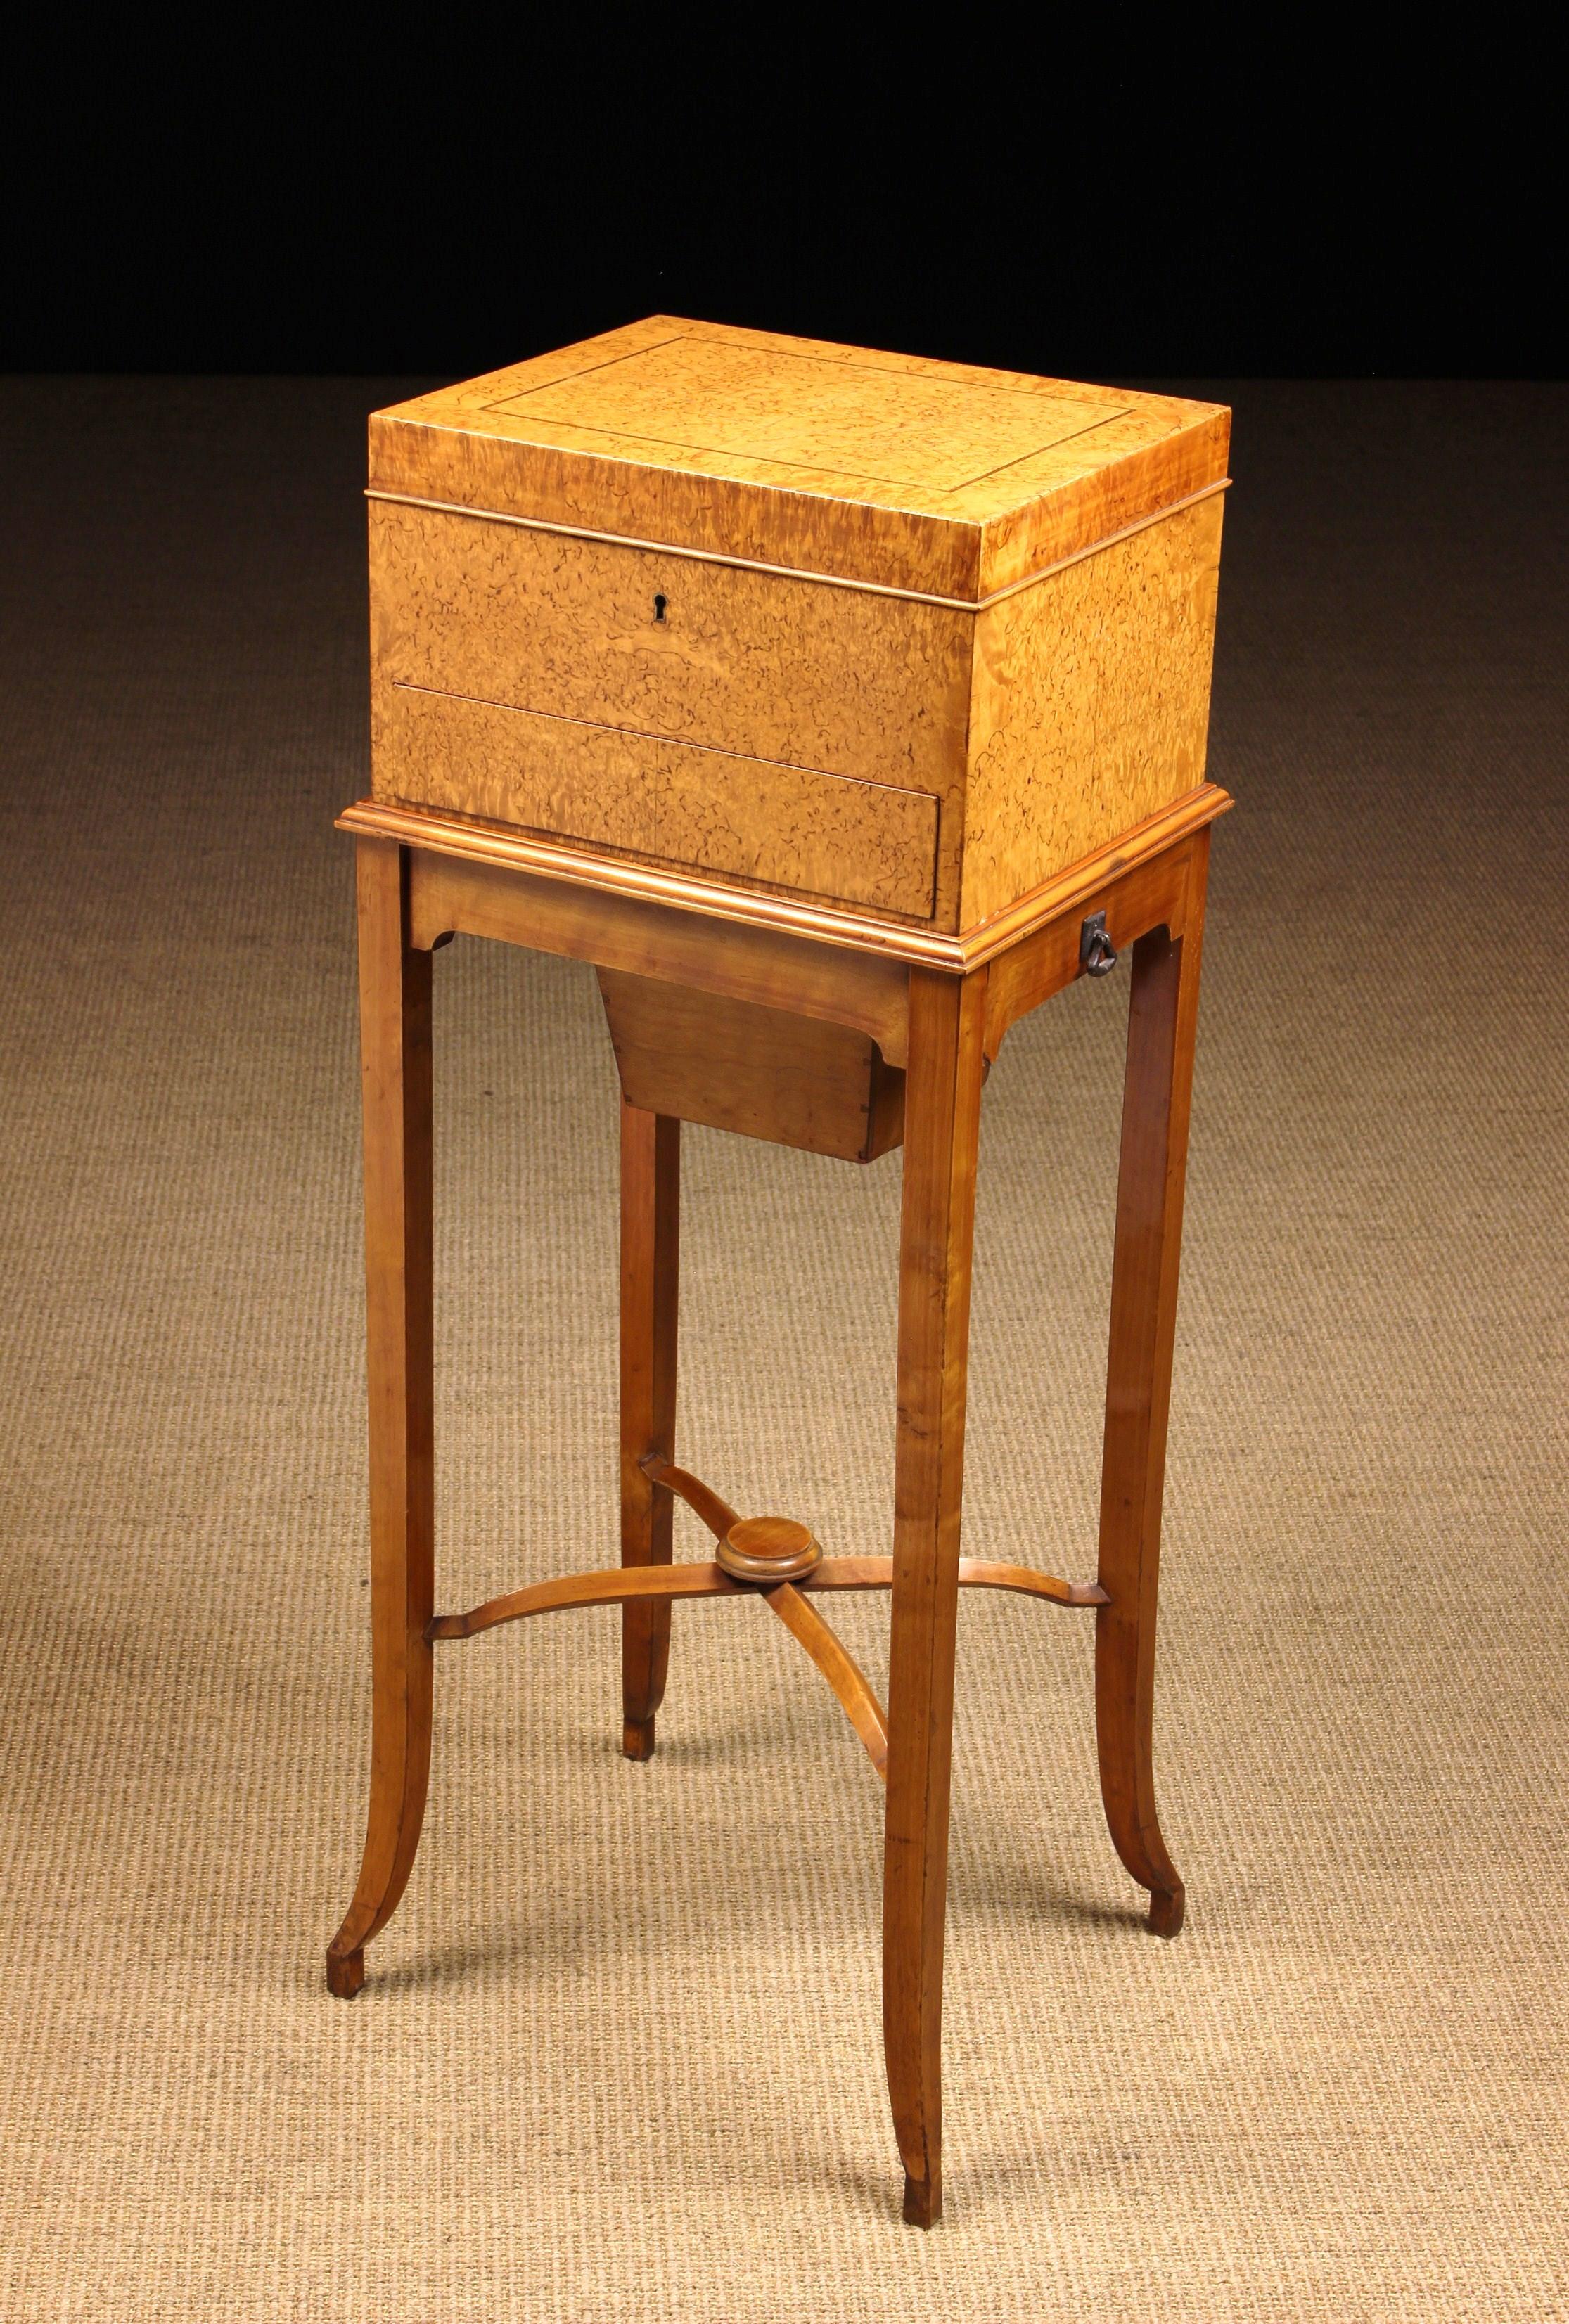 A Fine Scandanavian Figured Birch Vanity Box on Stand. - Image 2 of 2